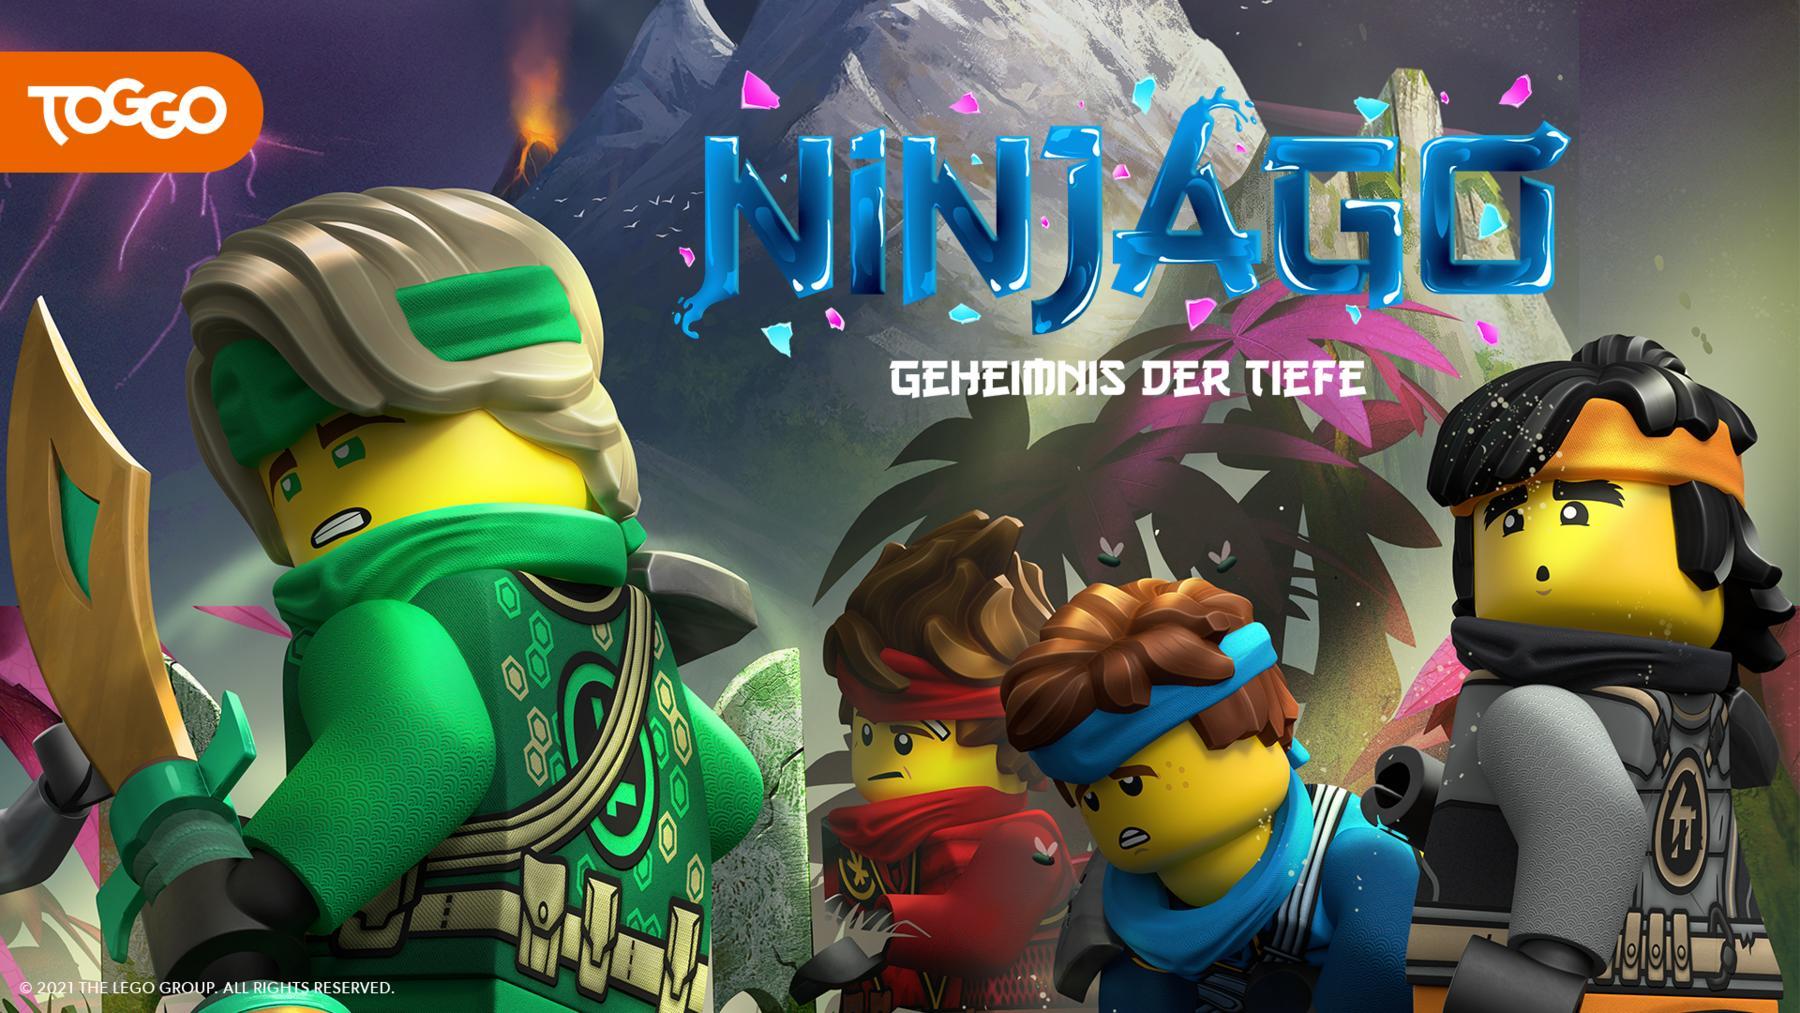 Ninjago - Geheimnis der Tiefe